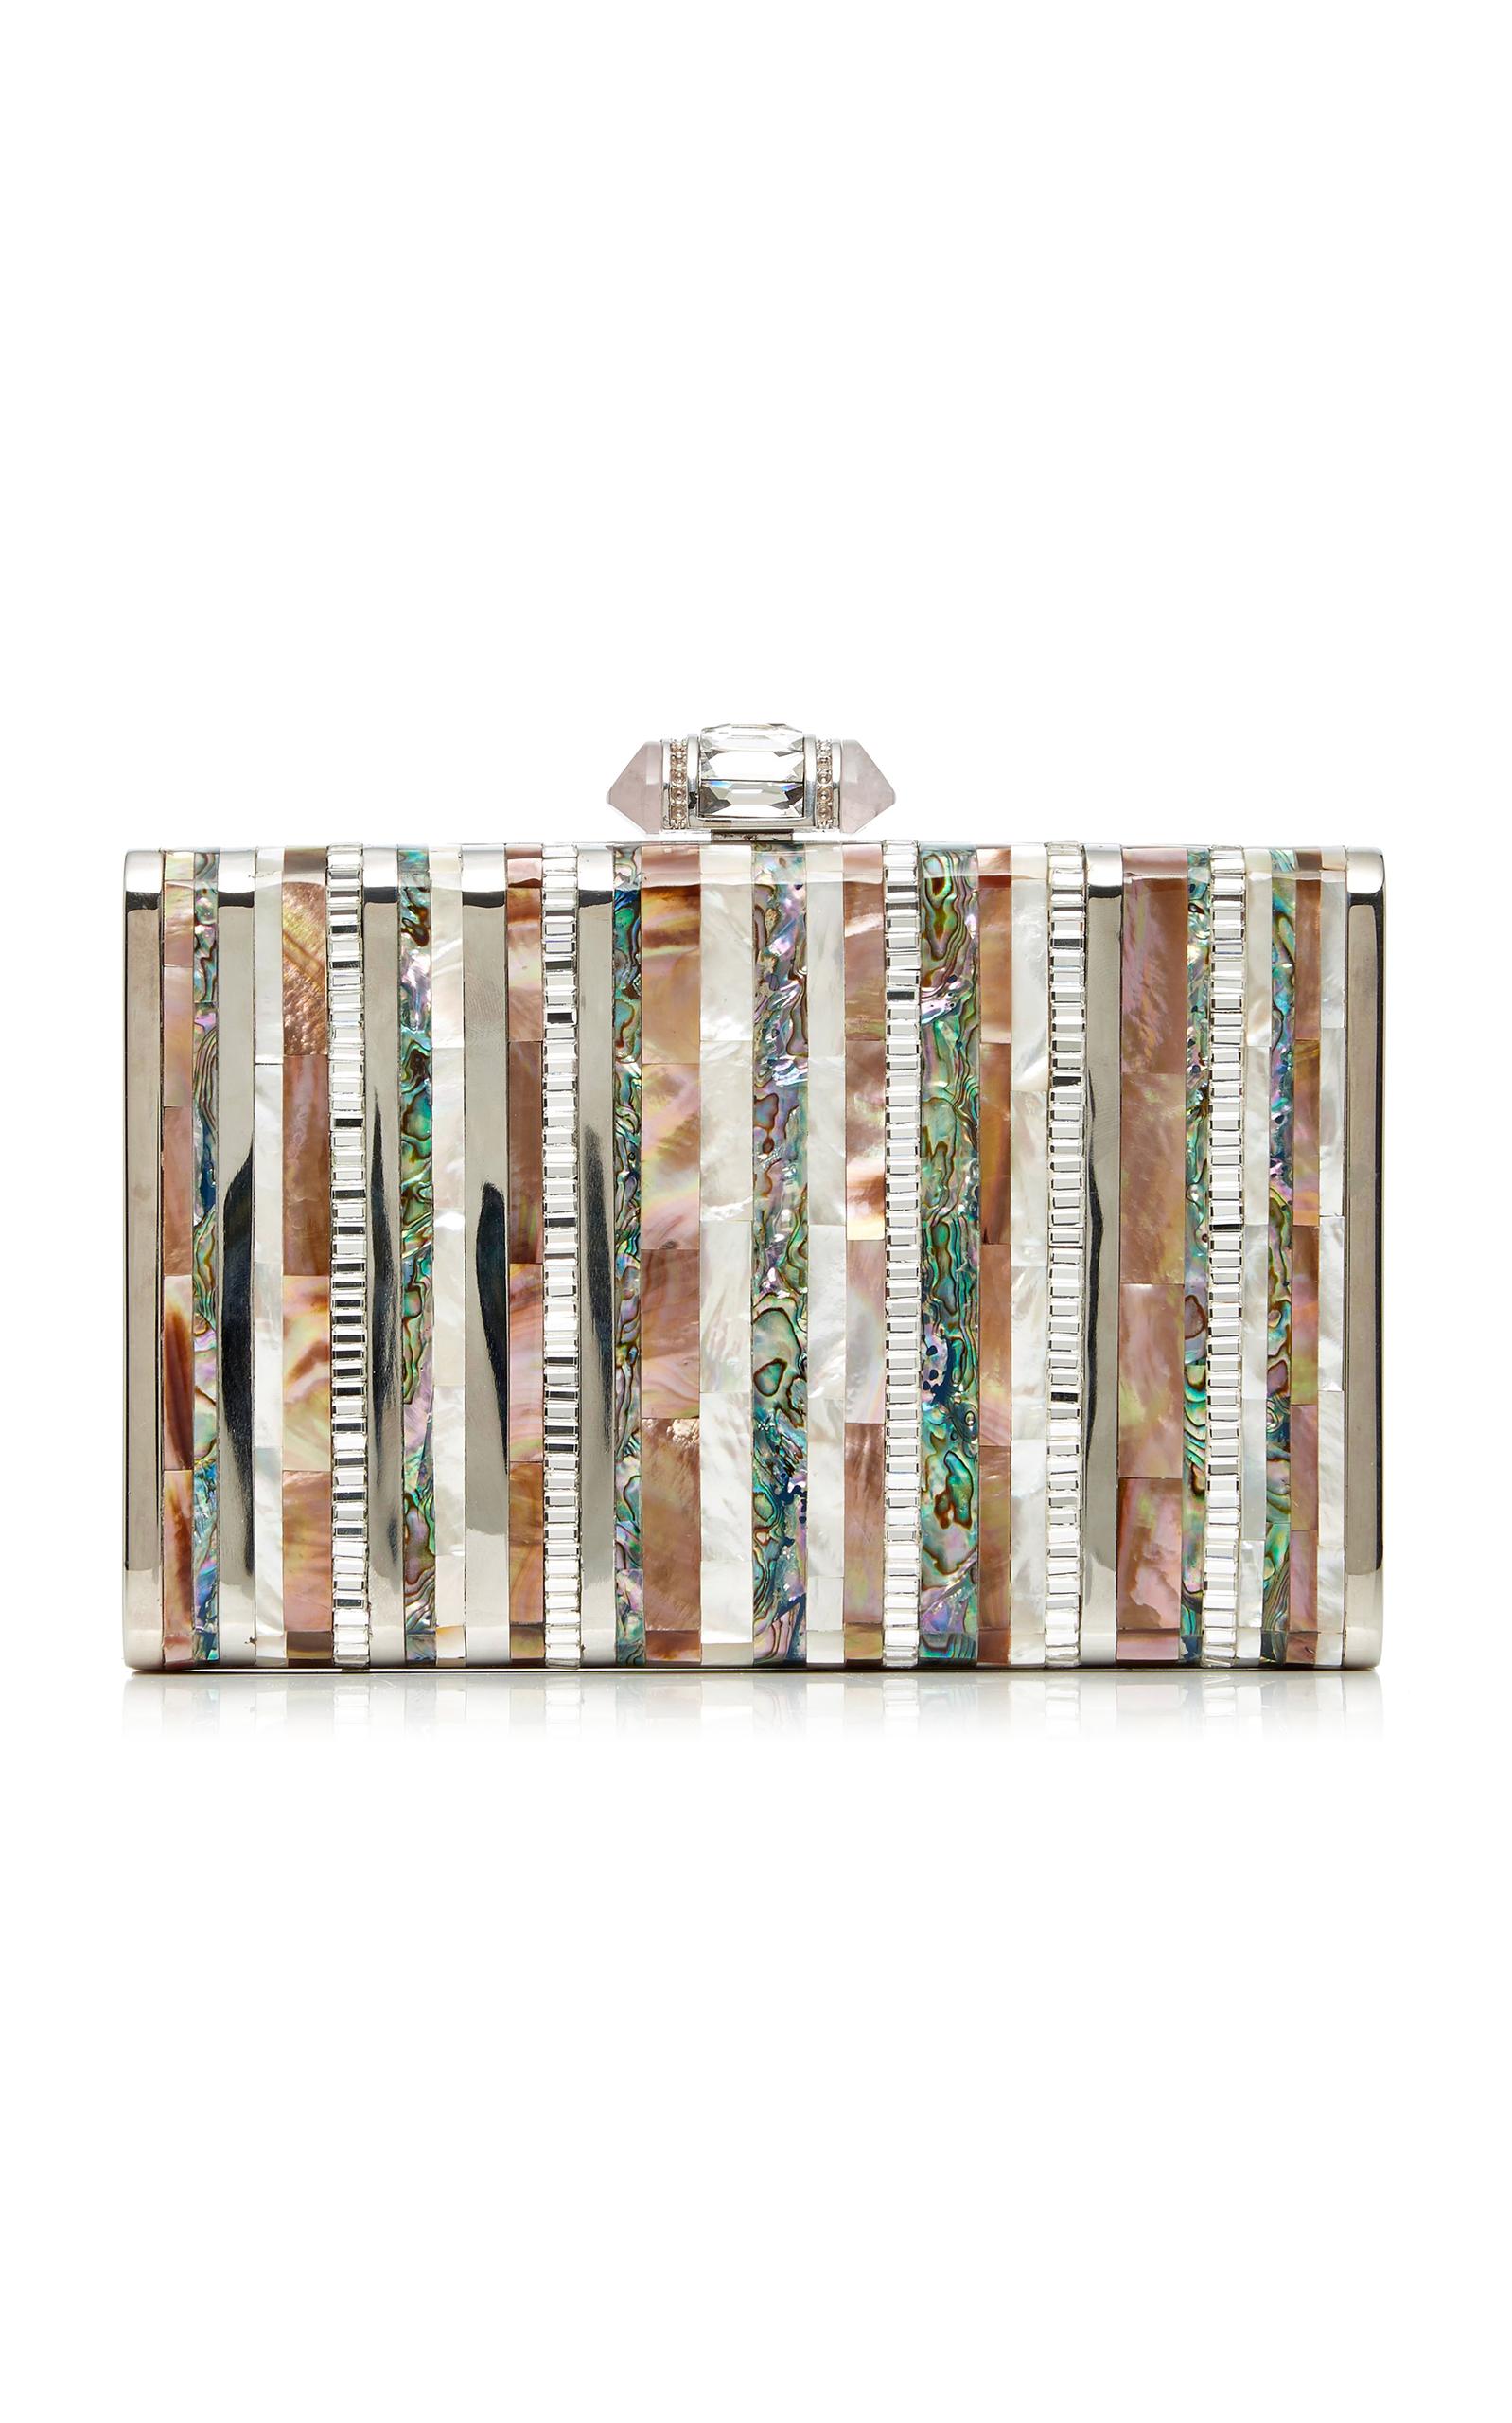 Judith Leiber Tall Slender Shell Stripes Clutch Bag, Silver